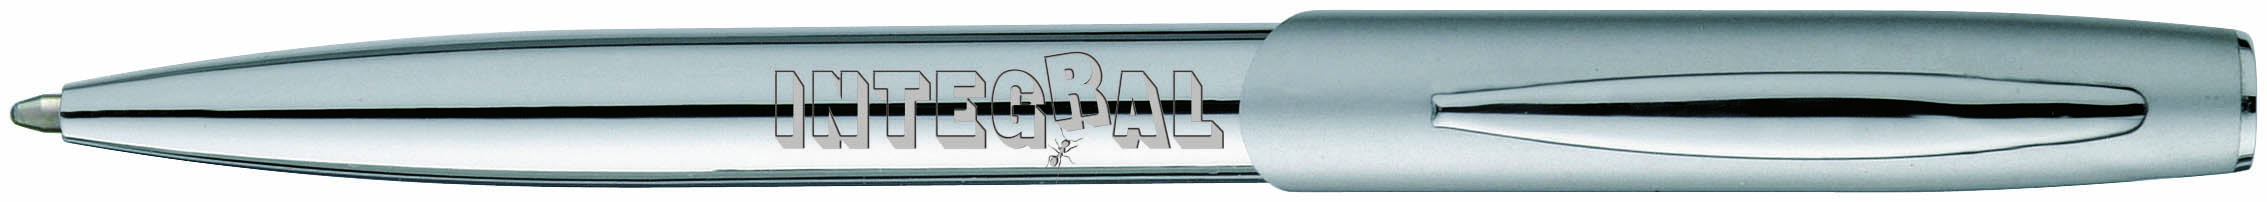 Werbeartikel Kugelschreiber Geneva